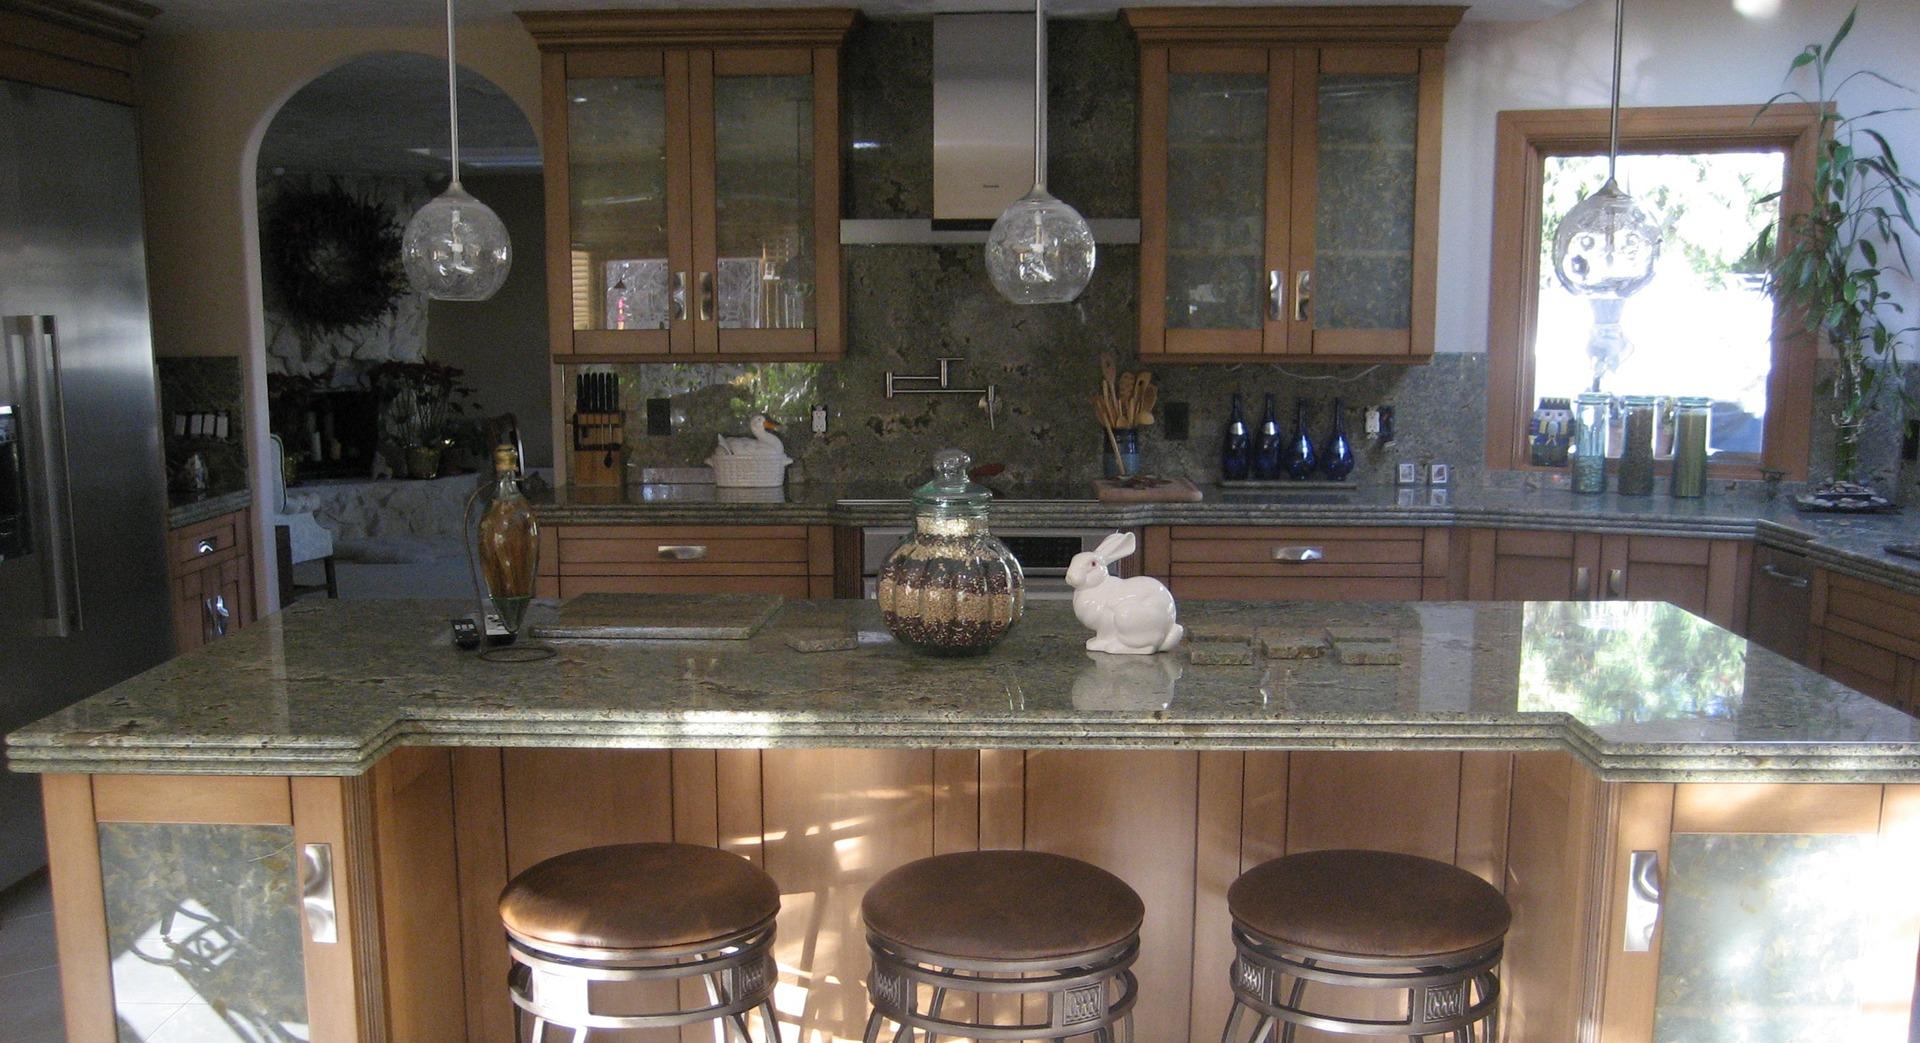 willbanks kitchen design kitchen remodel las vegas Custom Kitchen Cabinets